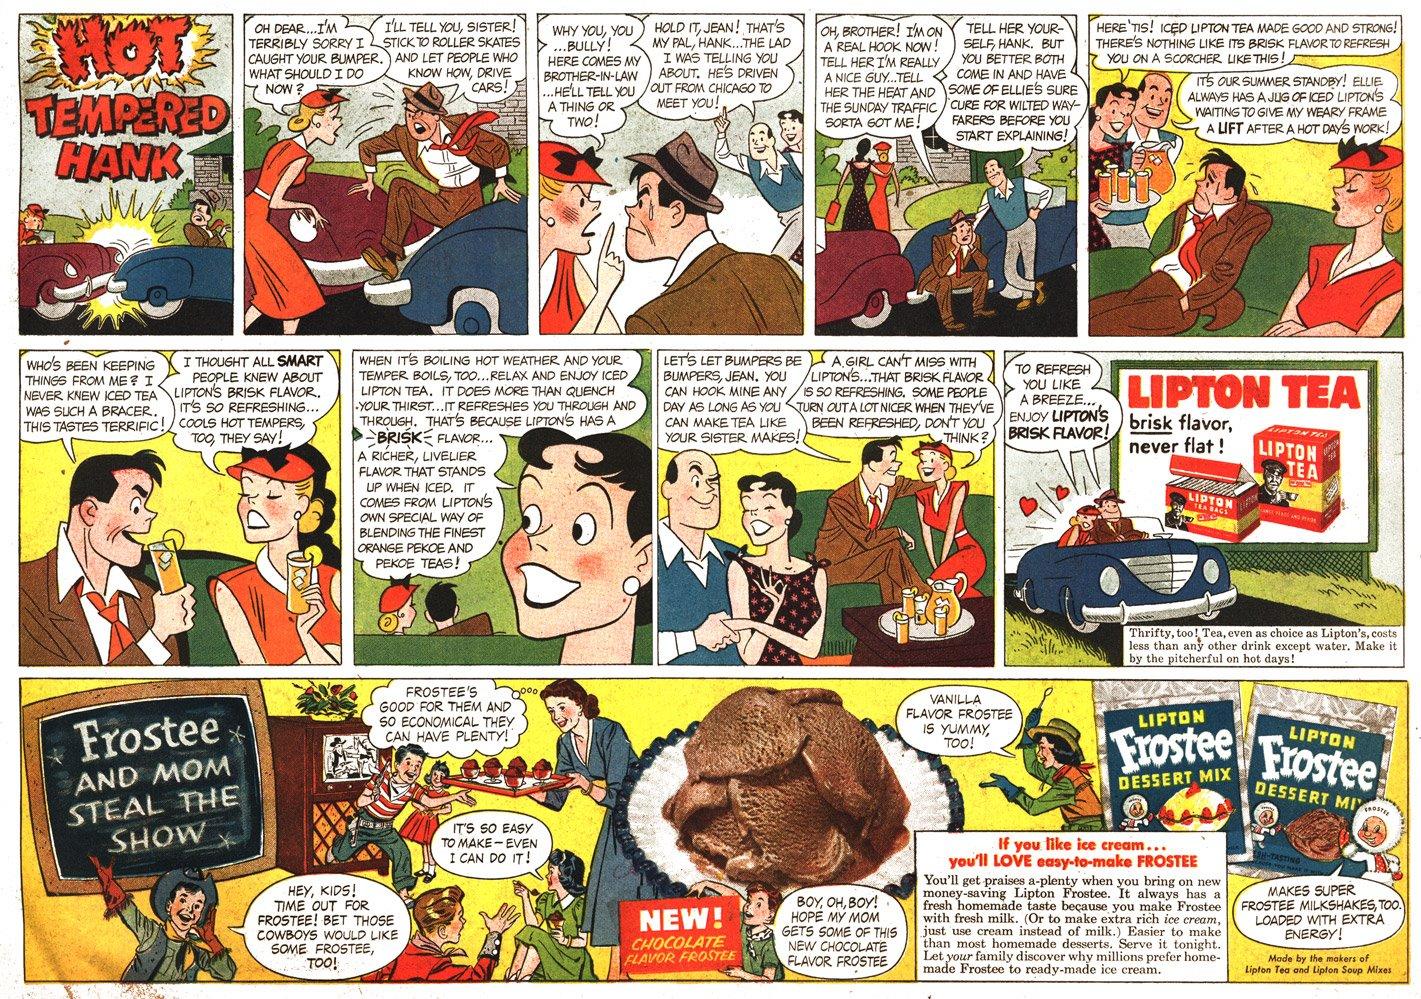 Lipton Tea ad by Dik Browne, May 27, 1951.